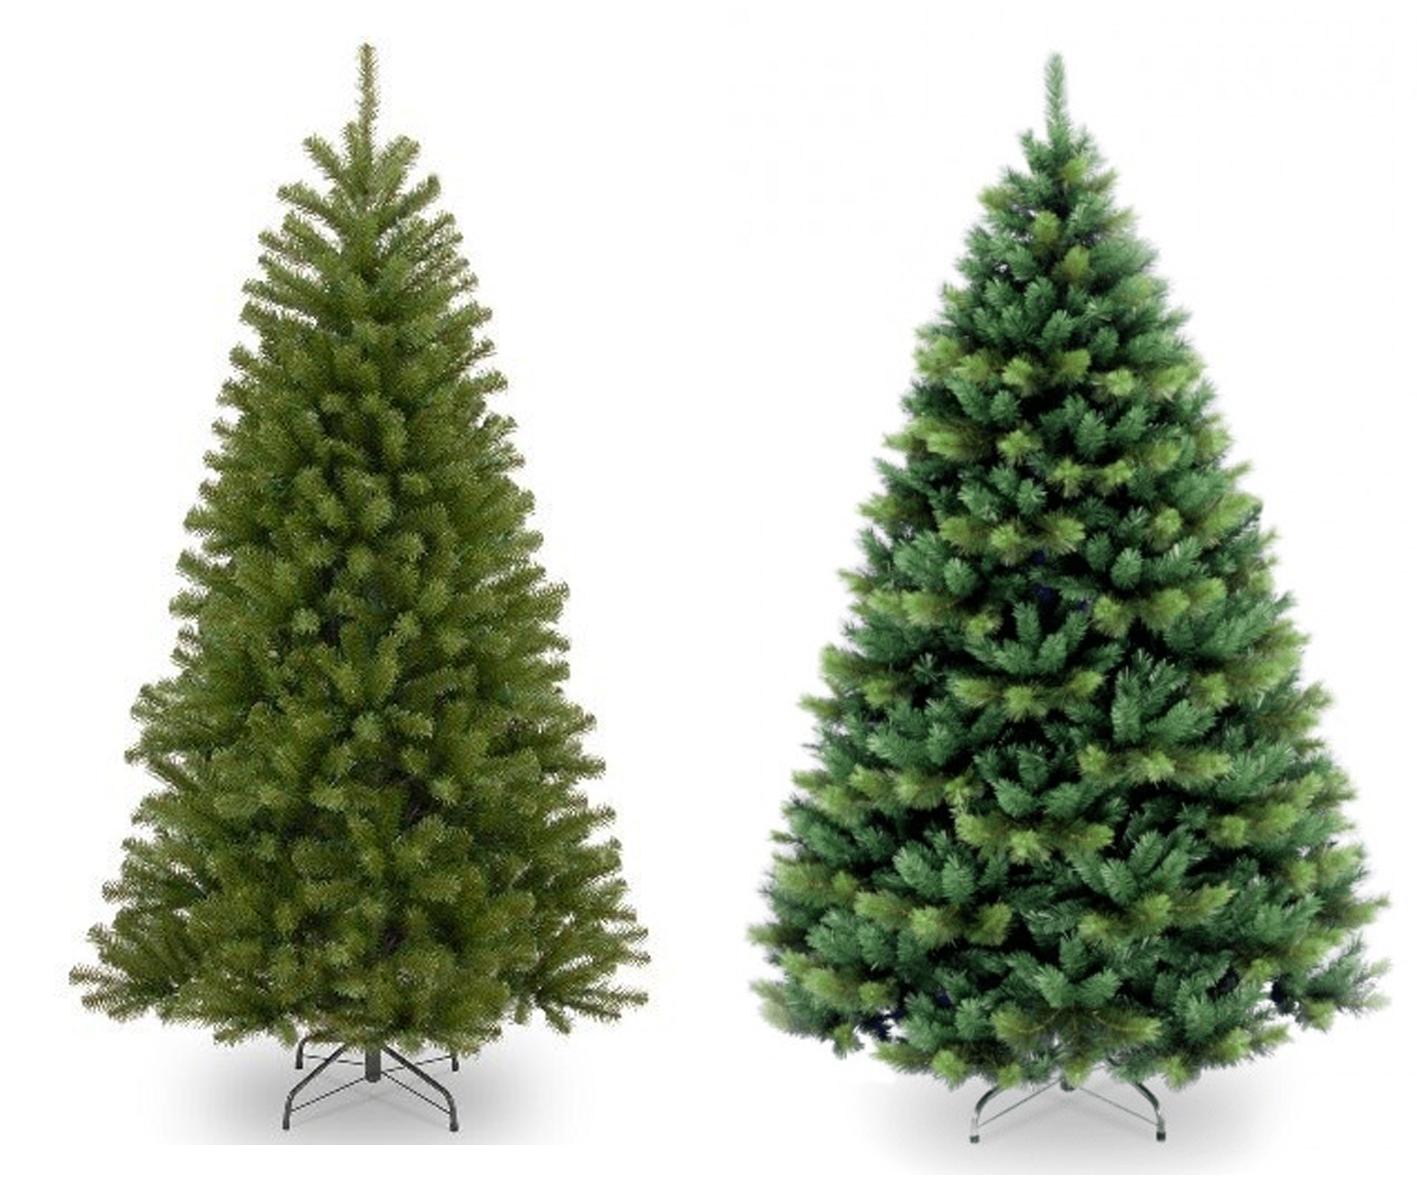 Christmas Trees at British Garden Centres